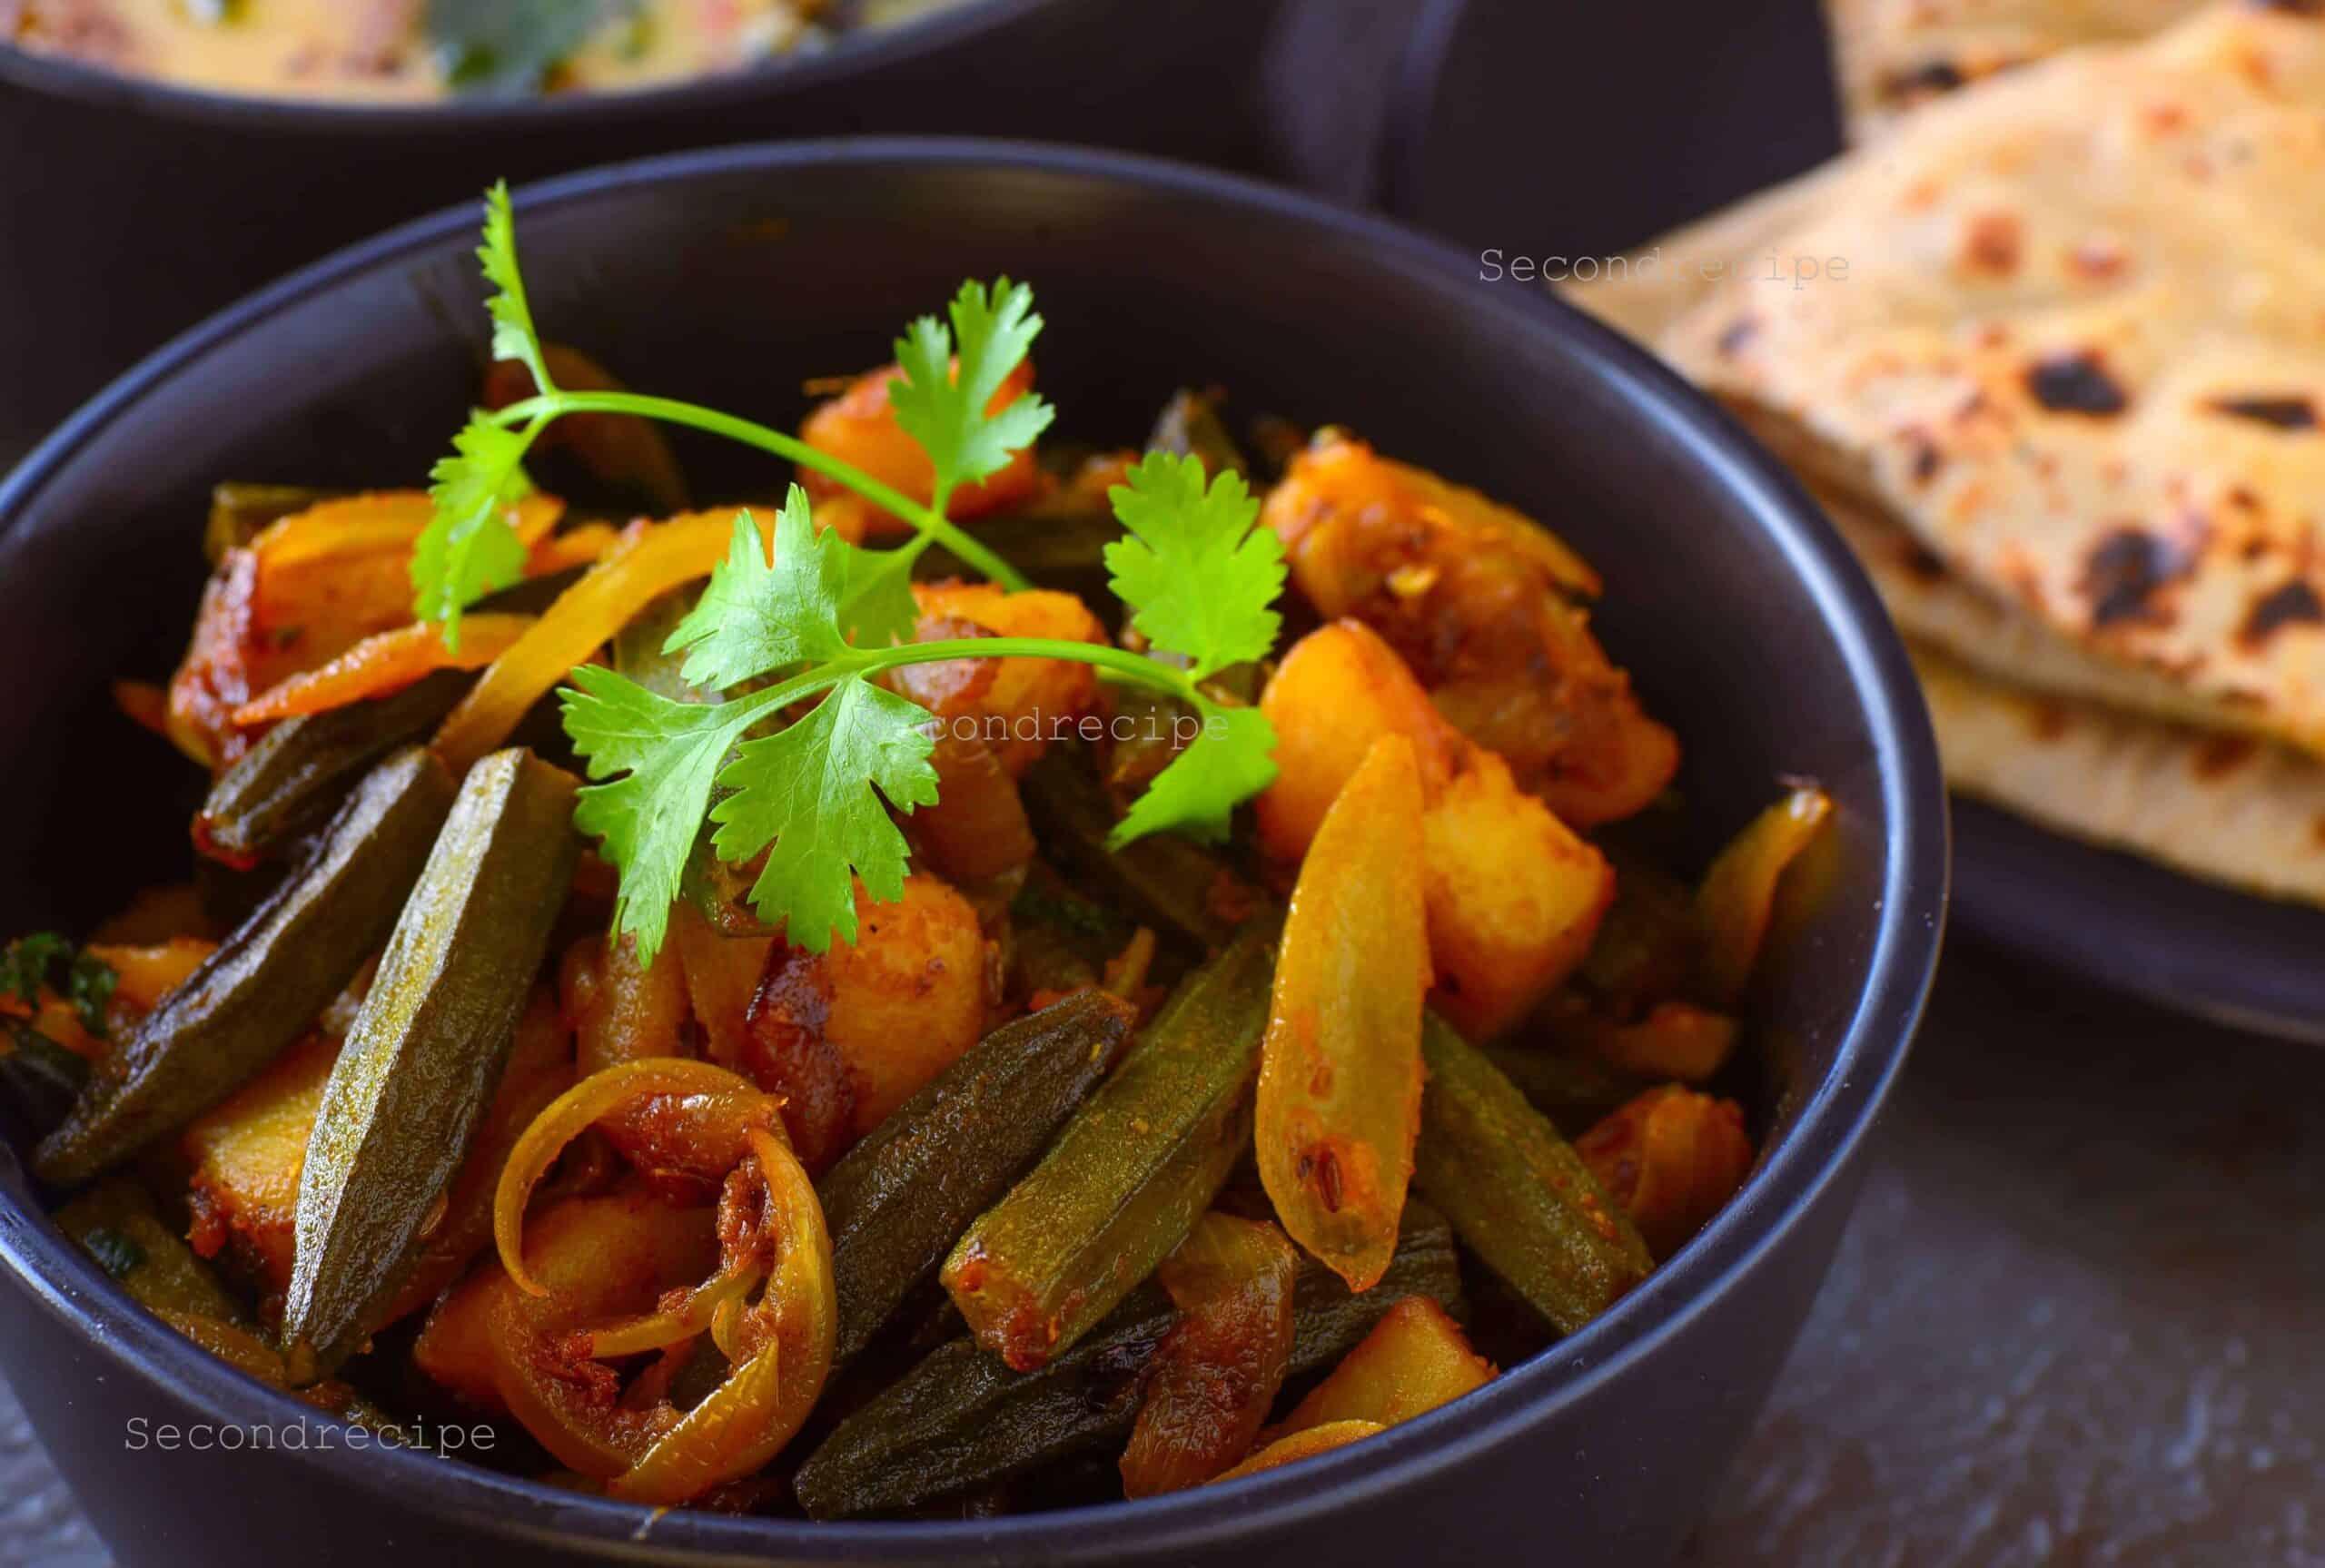 Bhindi basar patata-okra, onions & potato curry